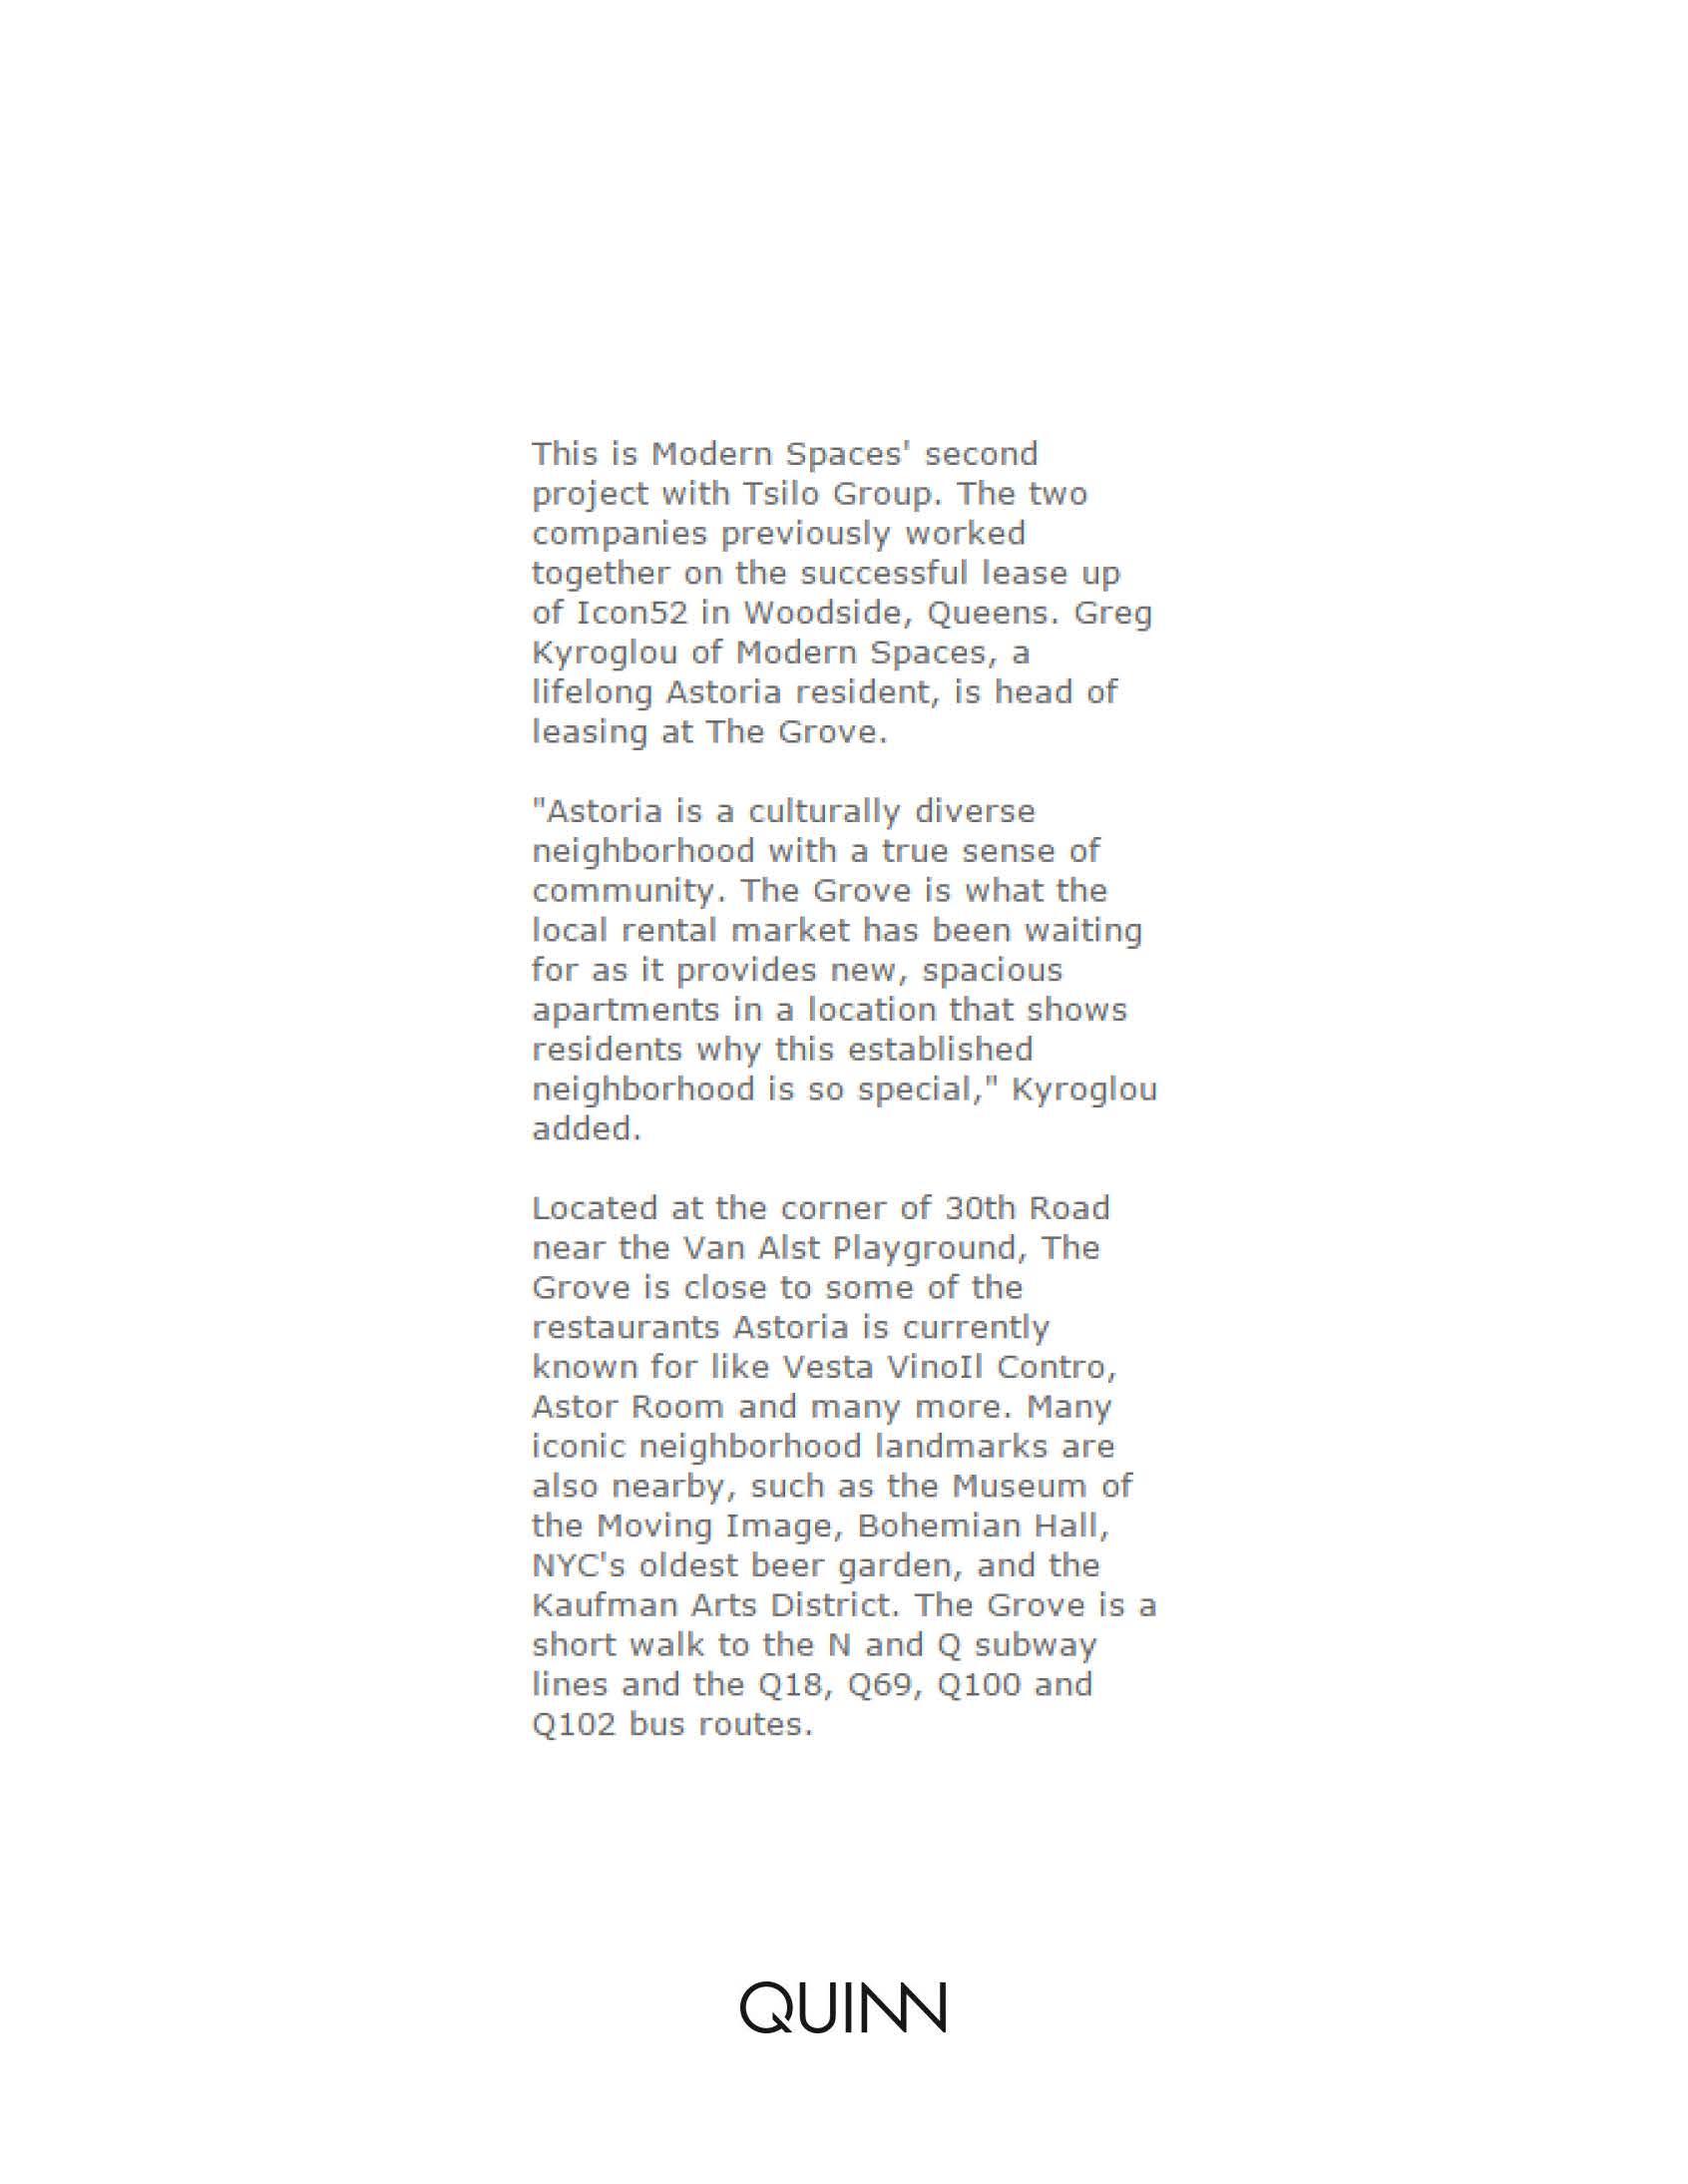 Mann Report - Newswire - 03.02.16 (1)_Page_3